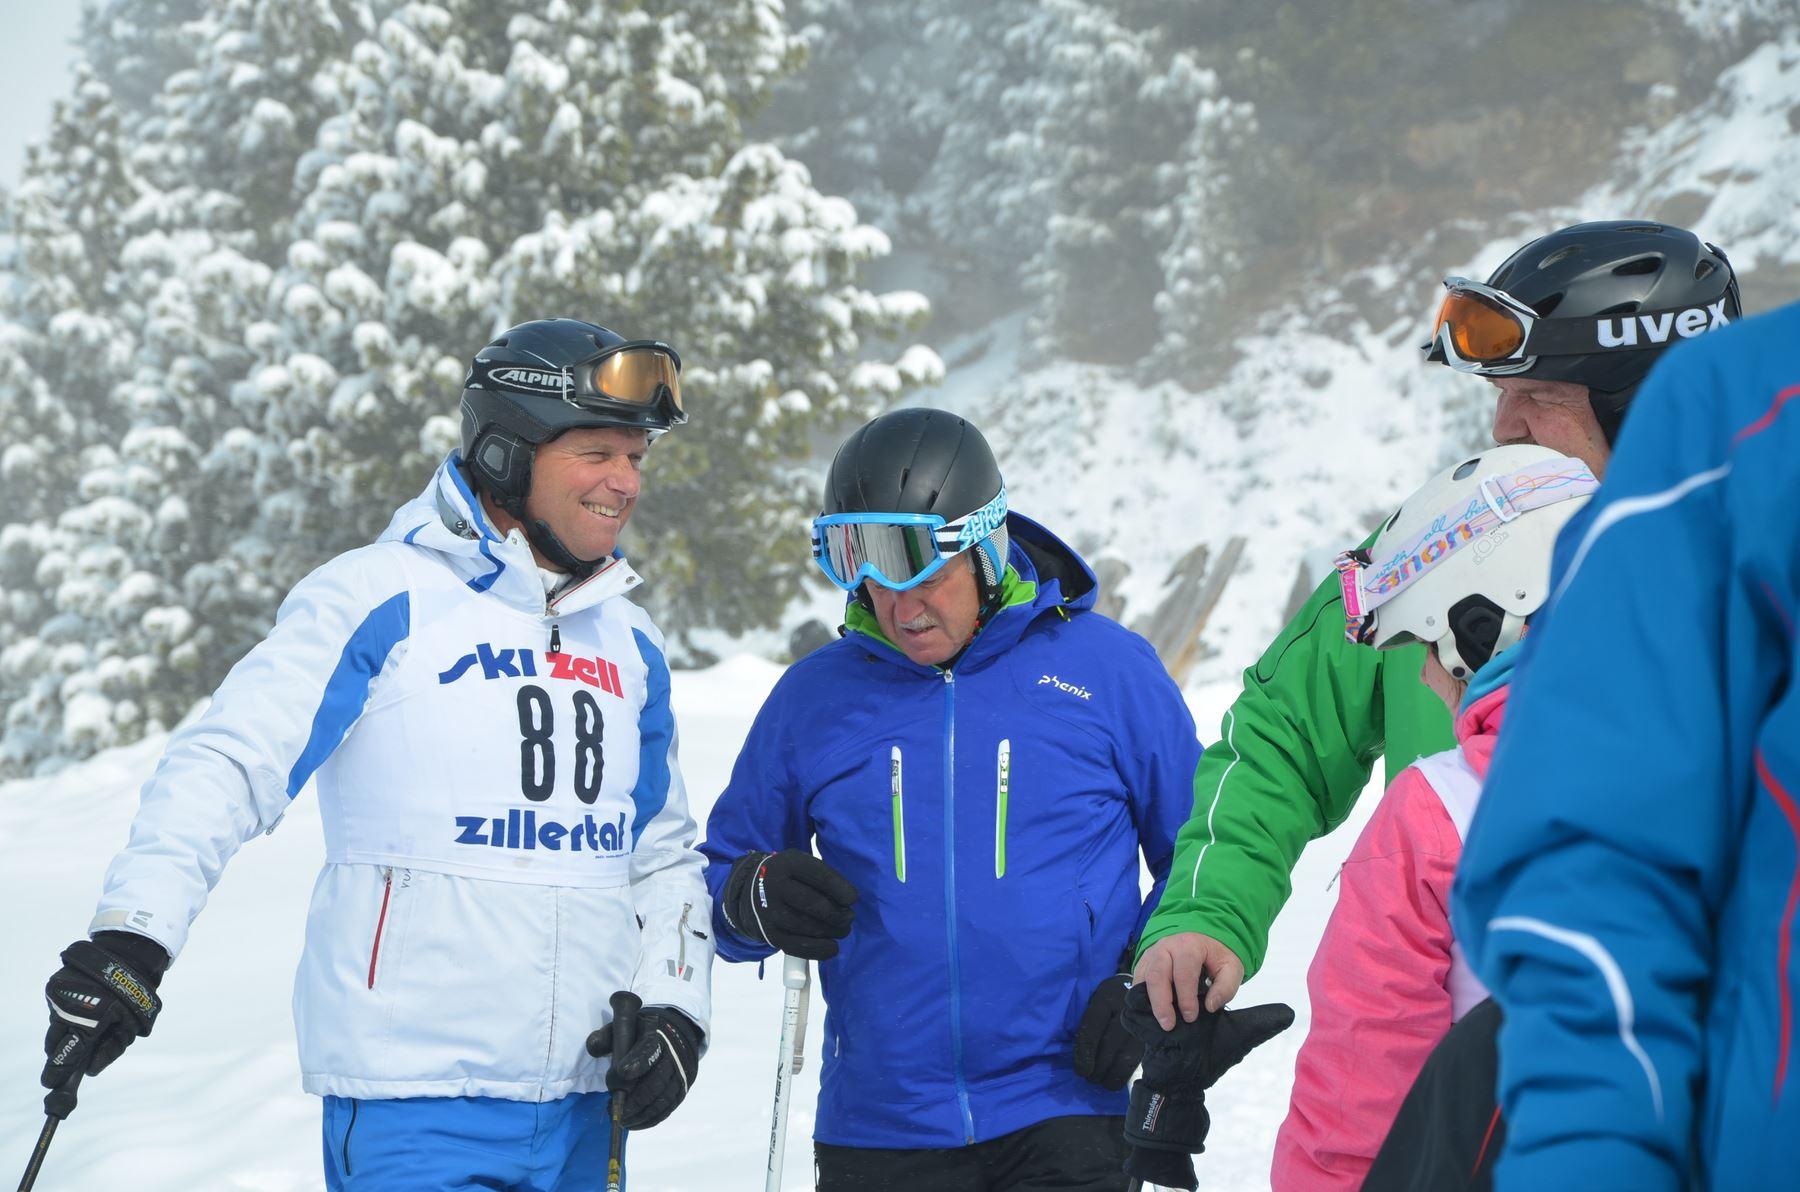 2015-03-22 BV Zillertal Skirennen 067.JPG